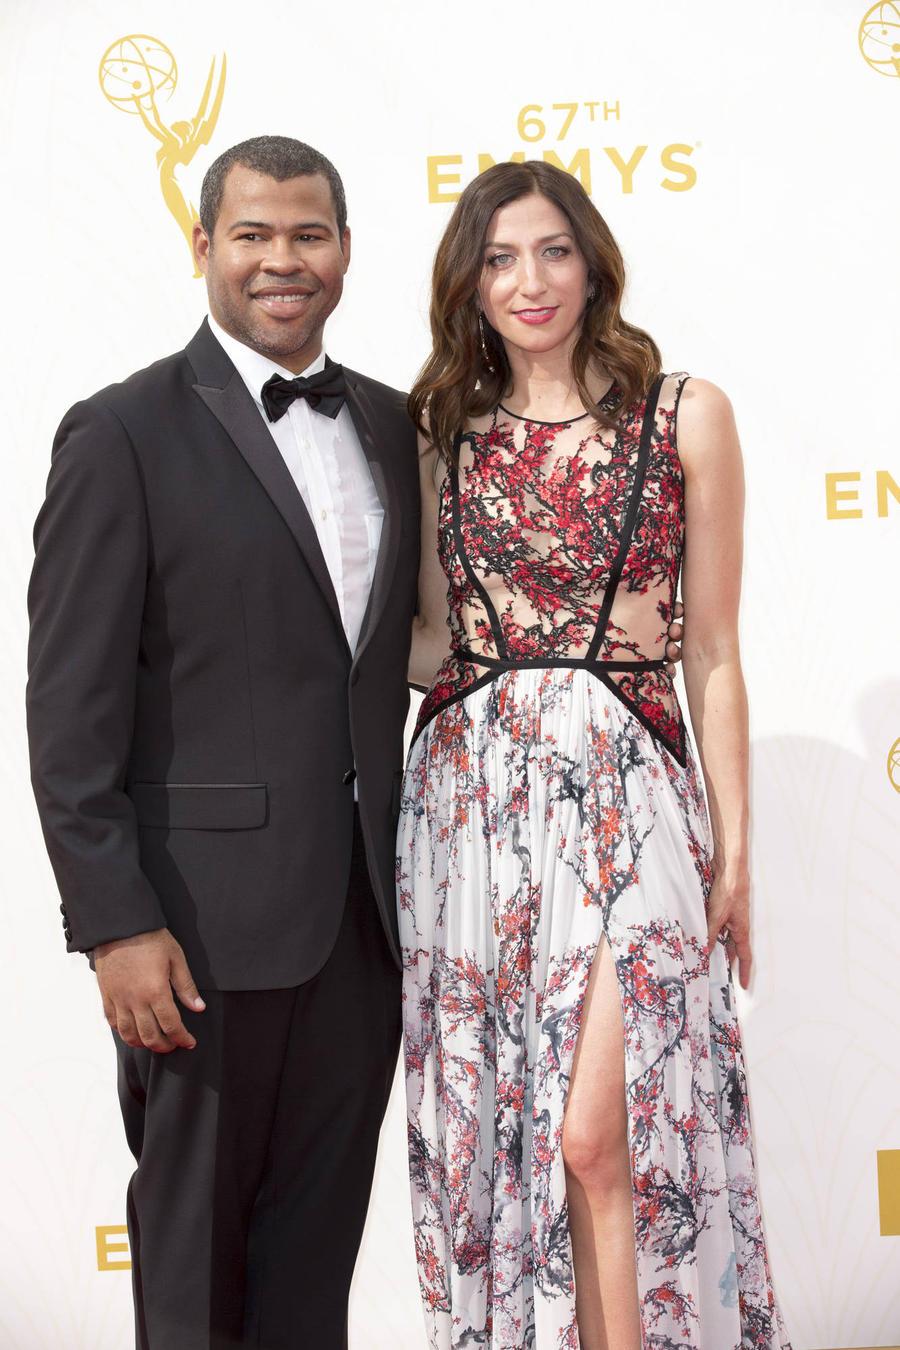 Comedians Chelsea Peretti And Jordan Peele Elope